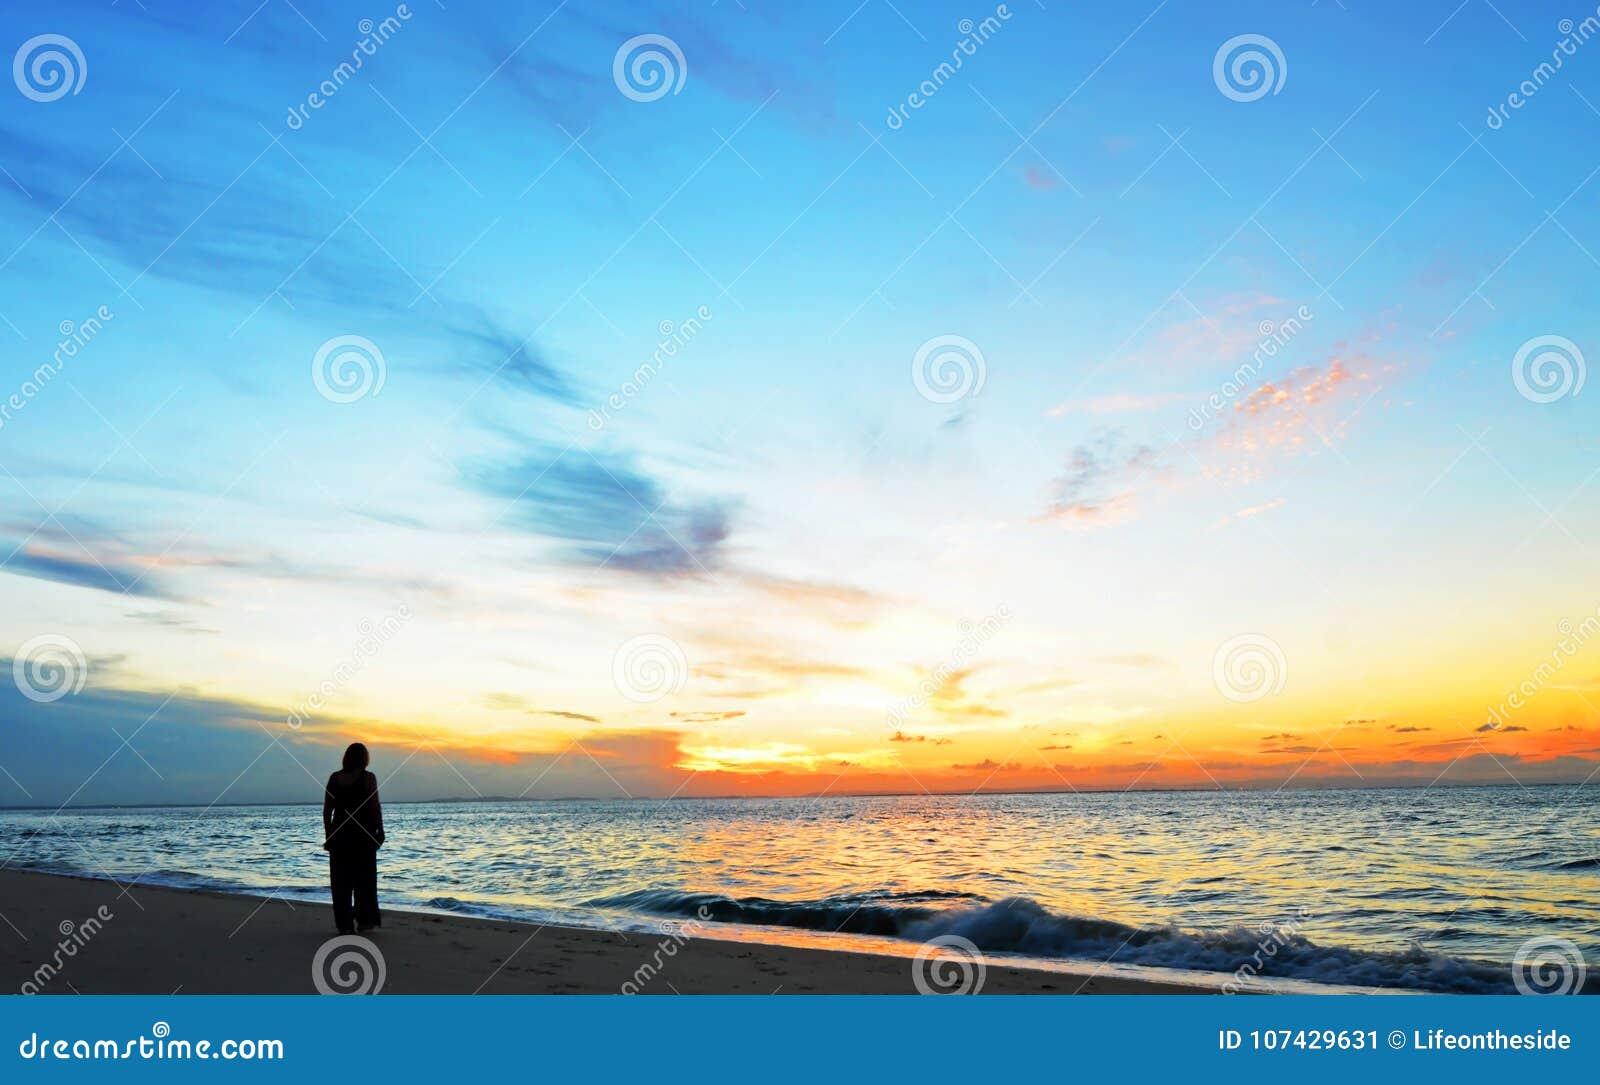 Silhouette woman,sunset on ocean Amity Point beach, North Stradbroke Island,Australia